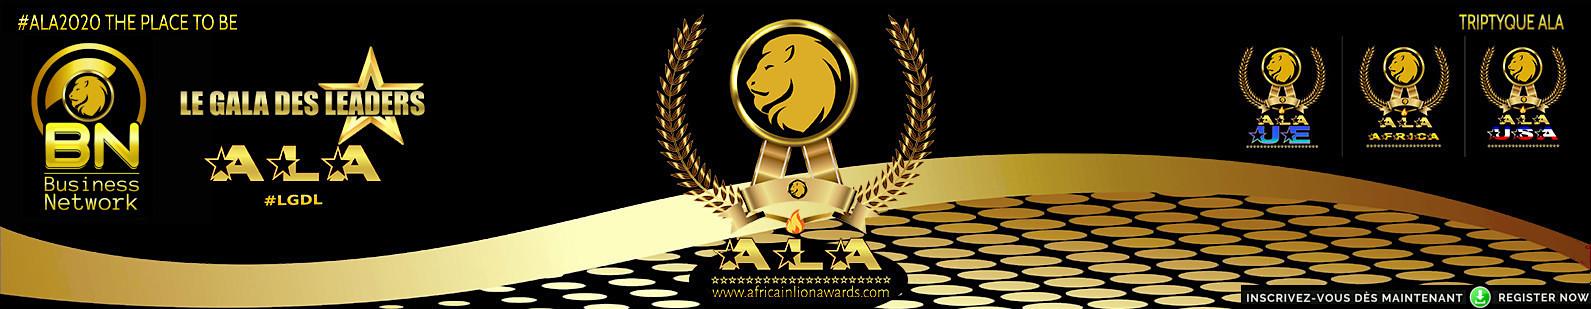 AFRICAIN LION AWARDS.COM